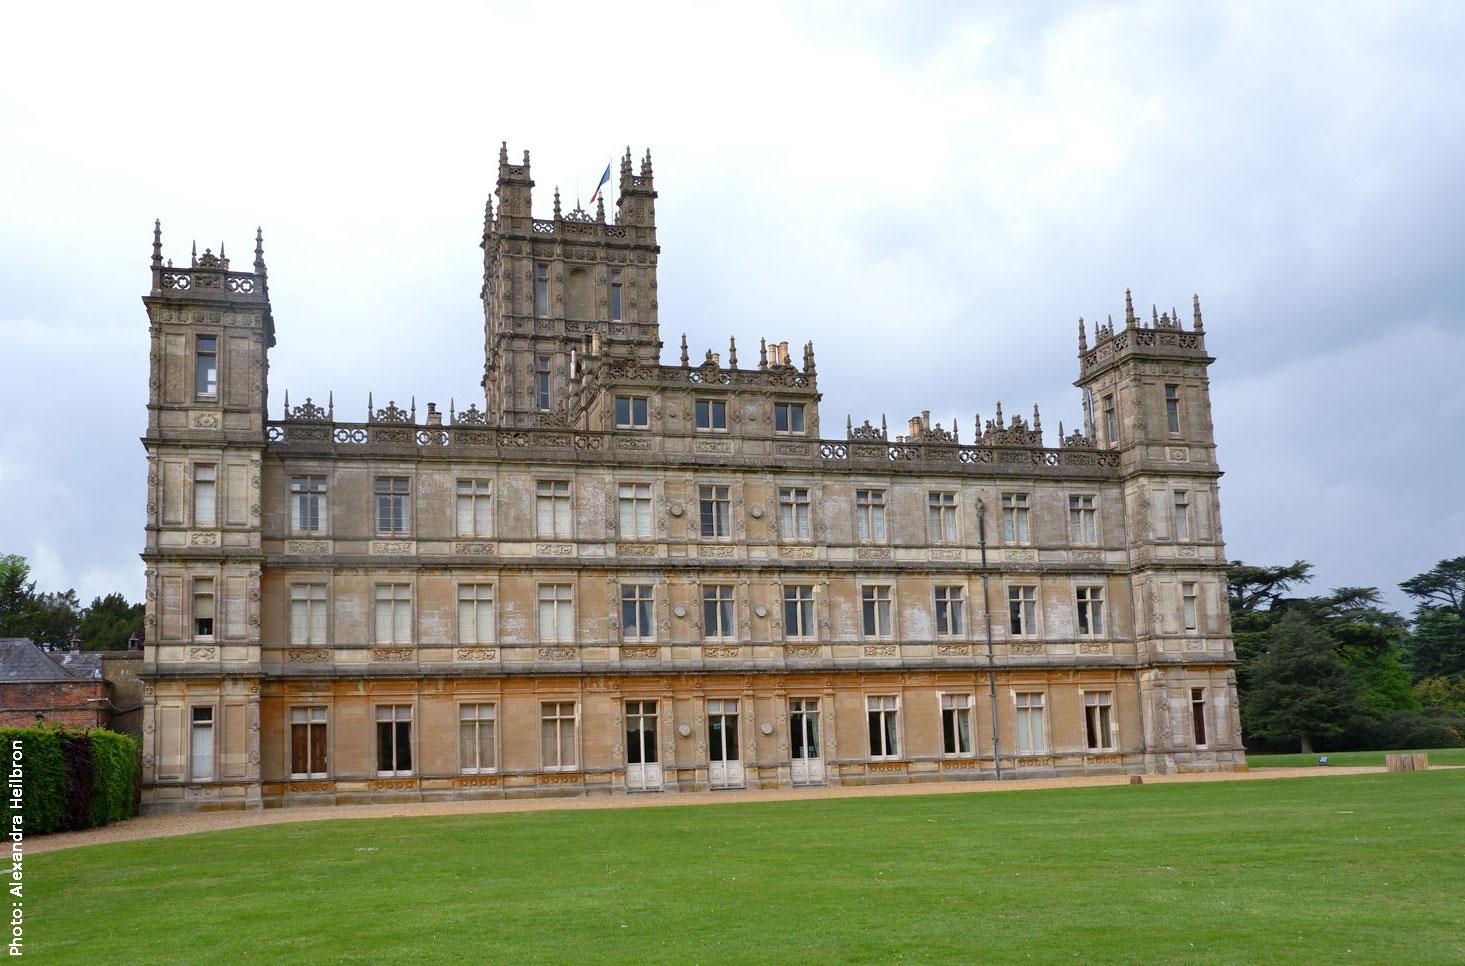 Downton Abbey, a.k.a. Highclere Castle